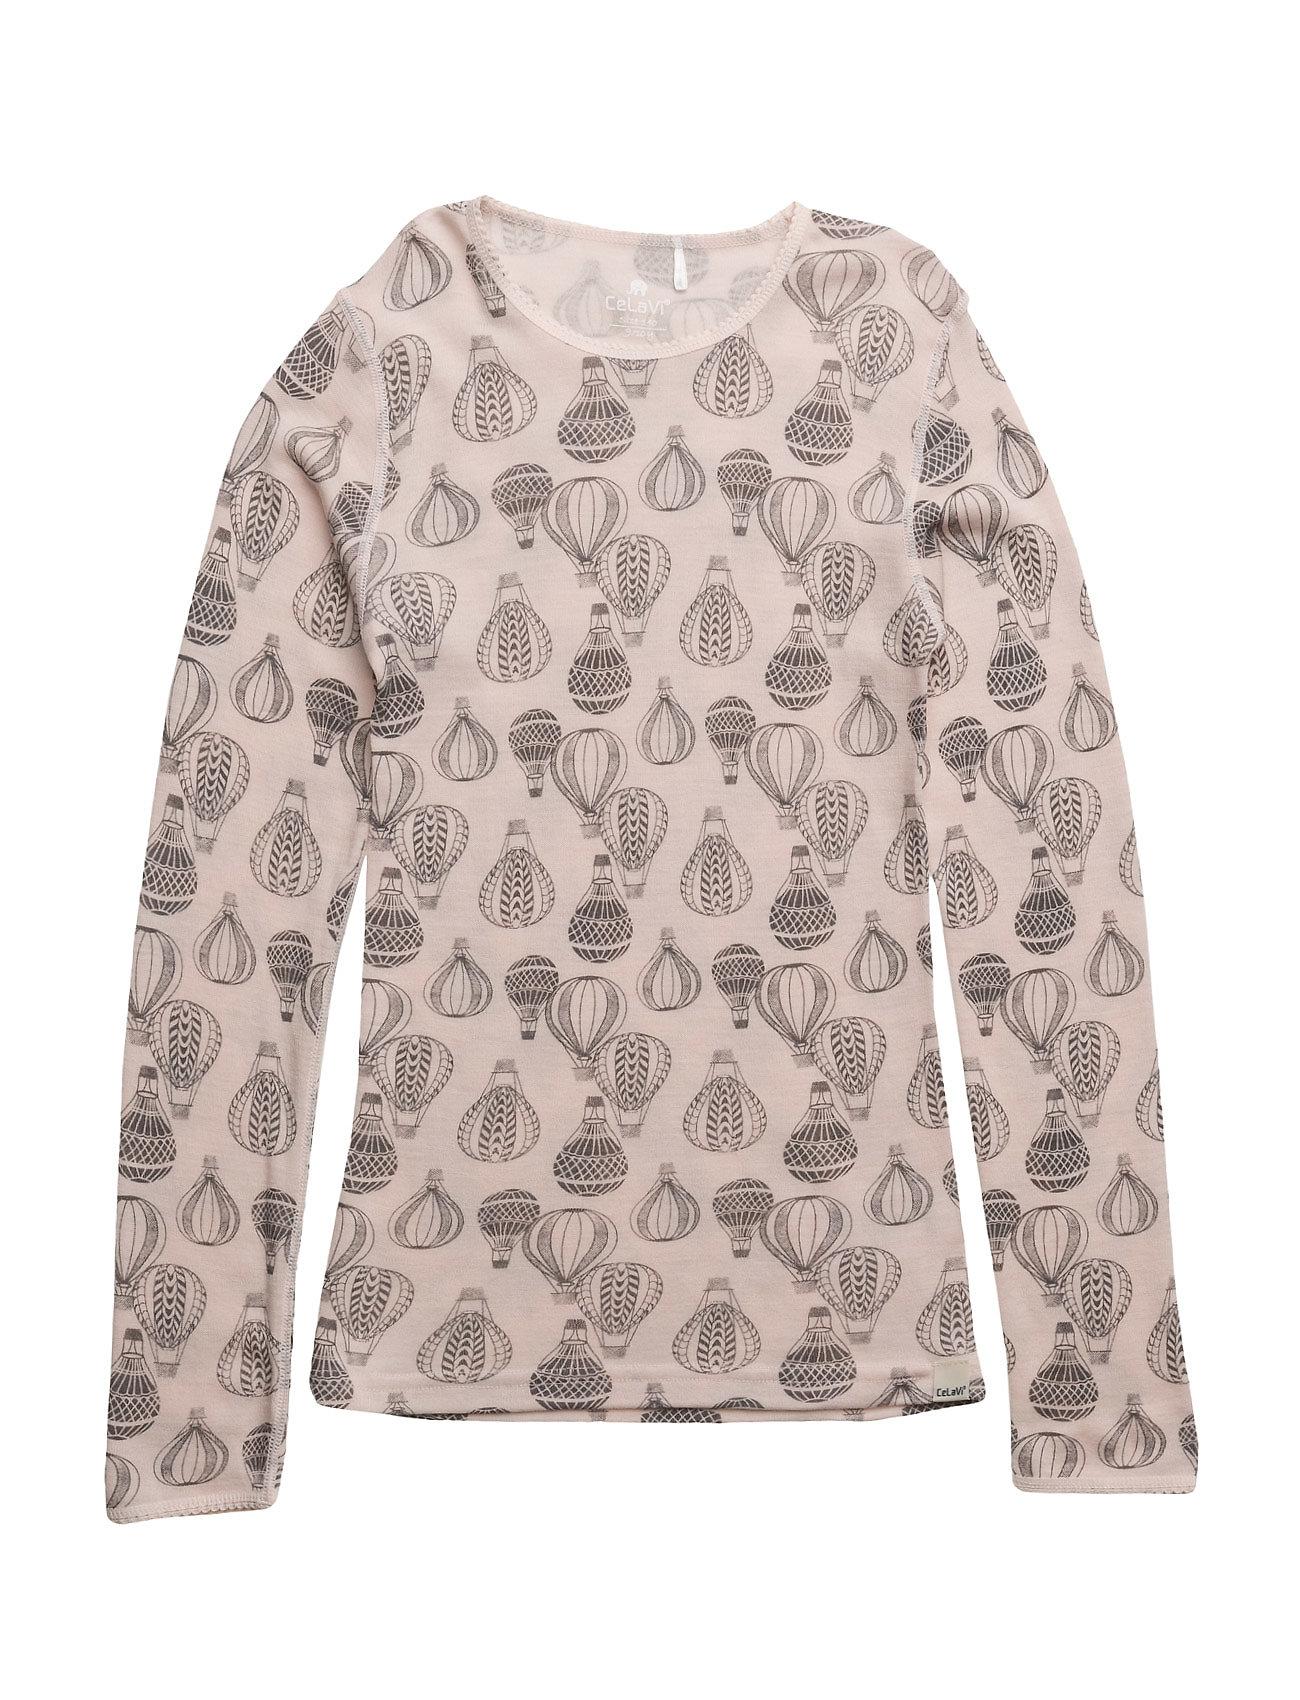 Undershirt Ls W. Aop Wool Wonder Wollies CeLaVi T-shirts til Piger i